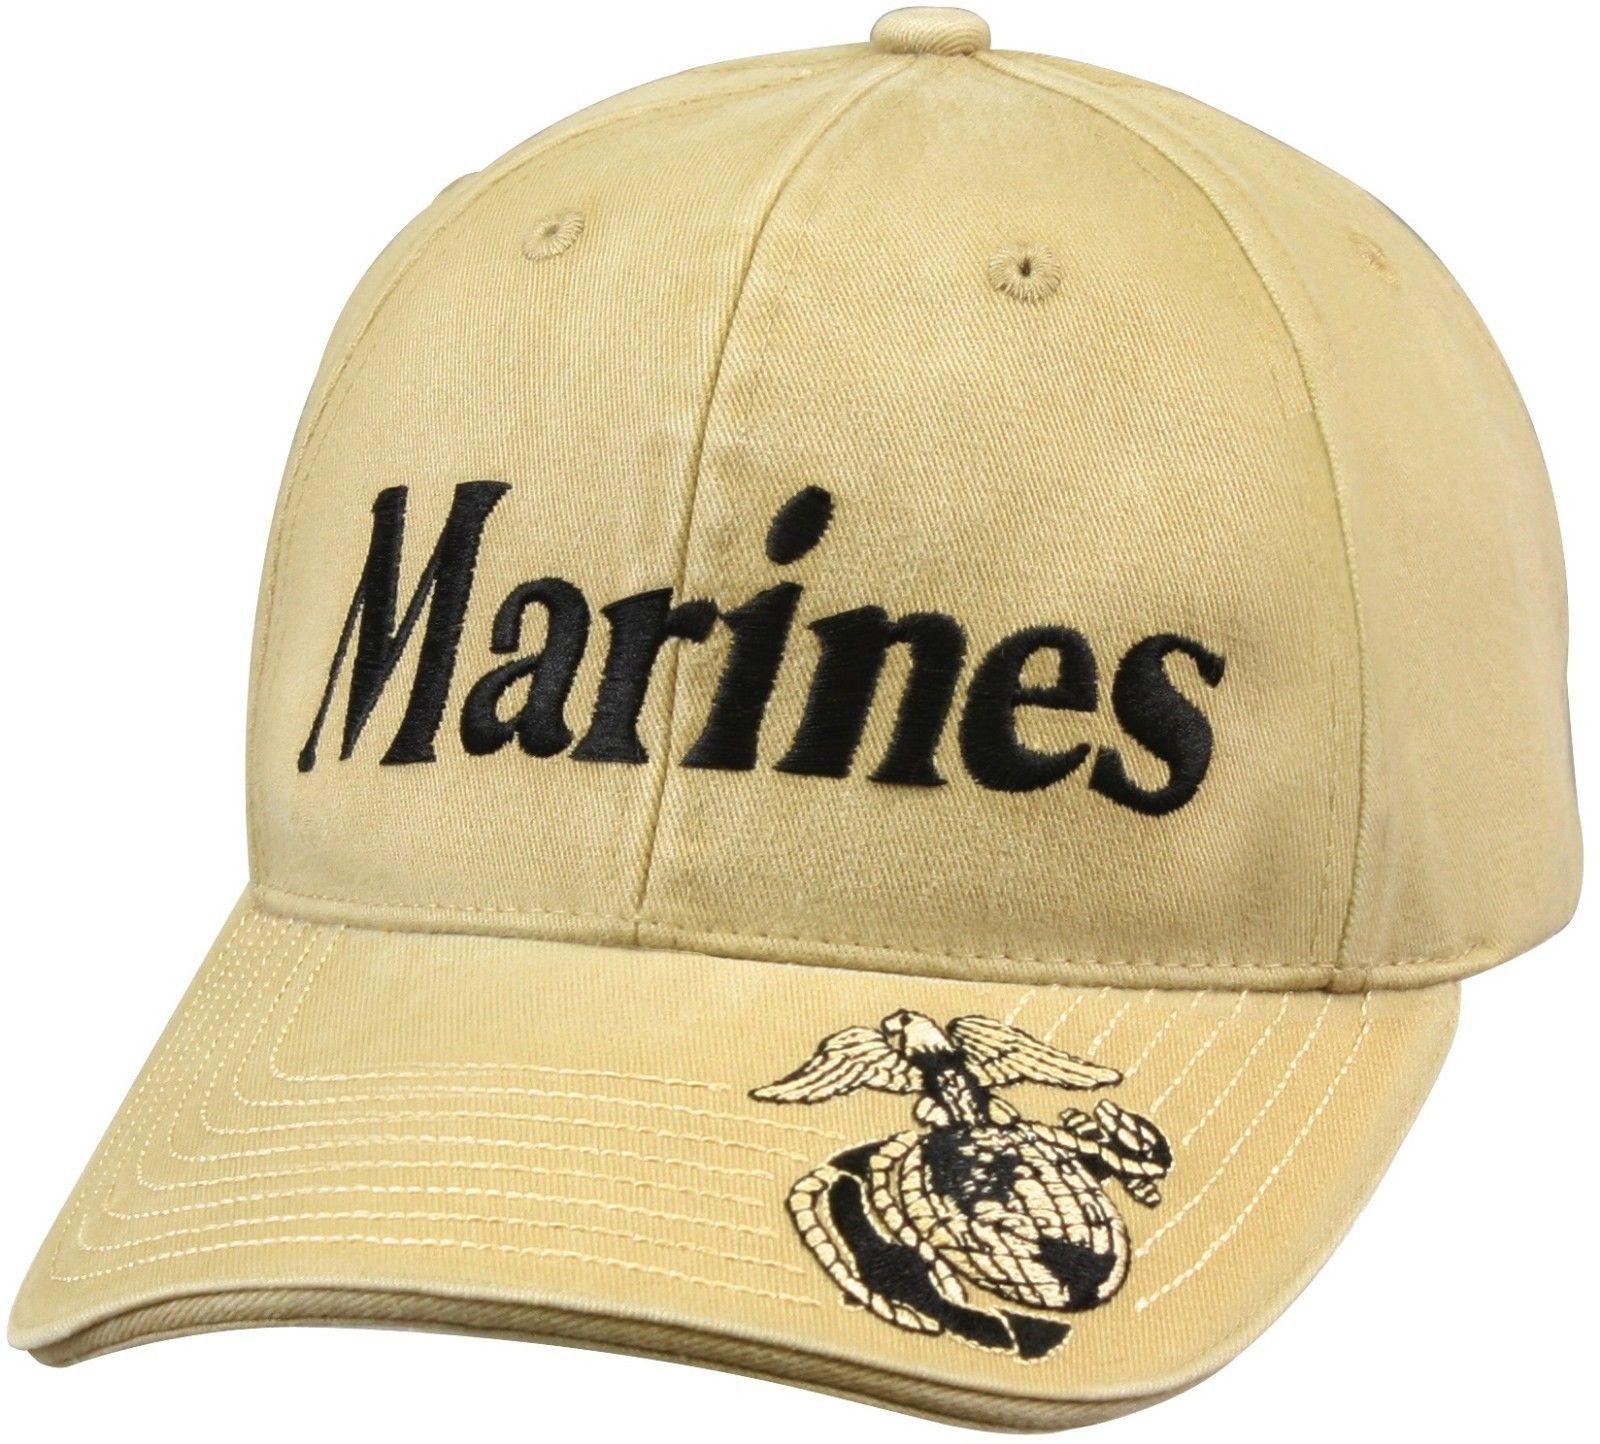 Khaki Marines - Vintage Deluxe Low Profile Insignia Cap